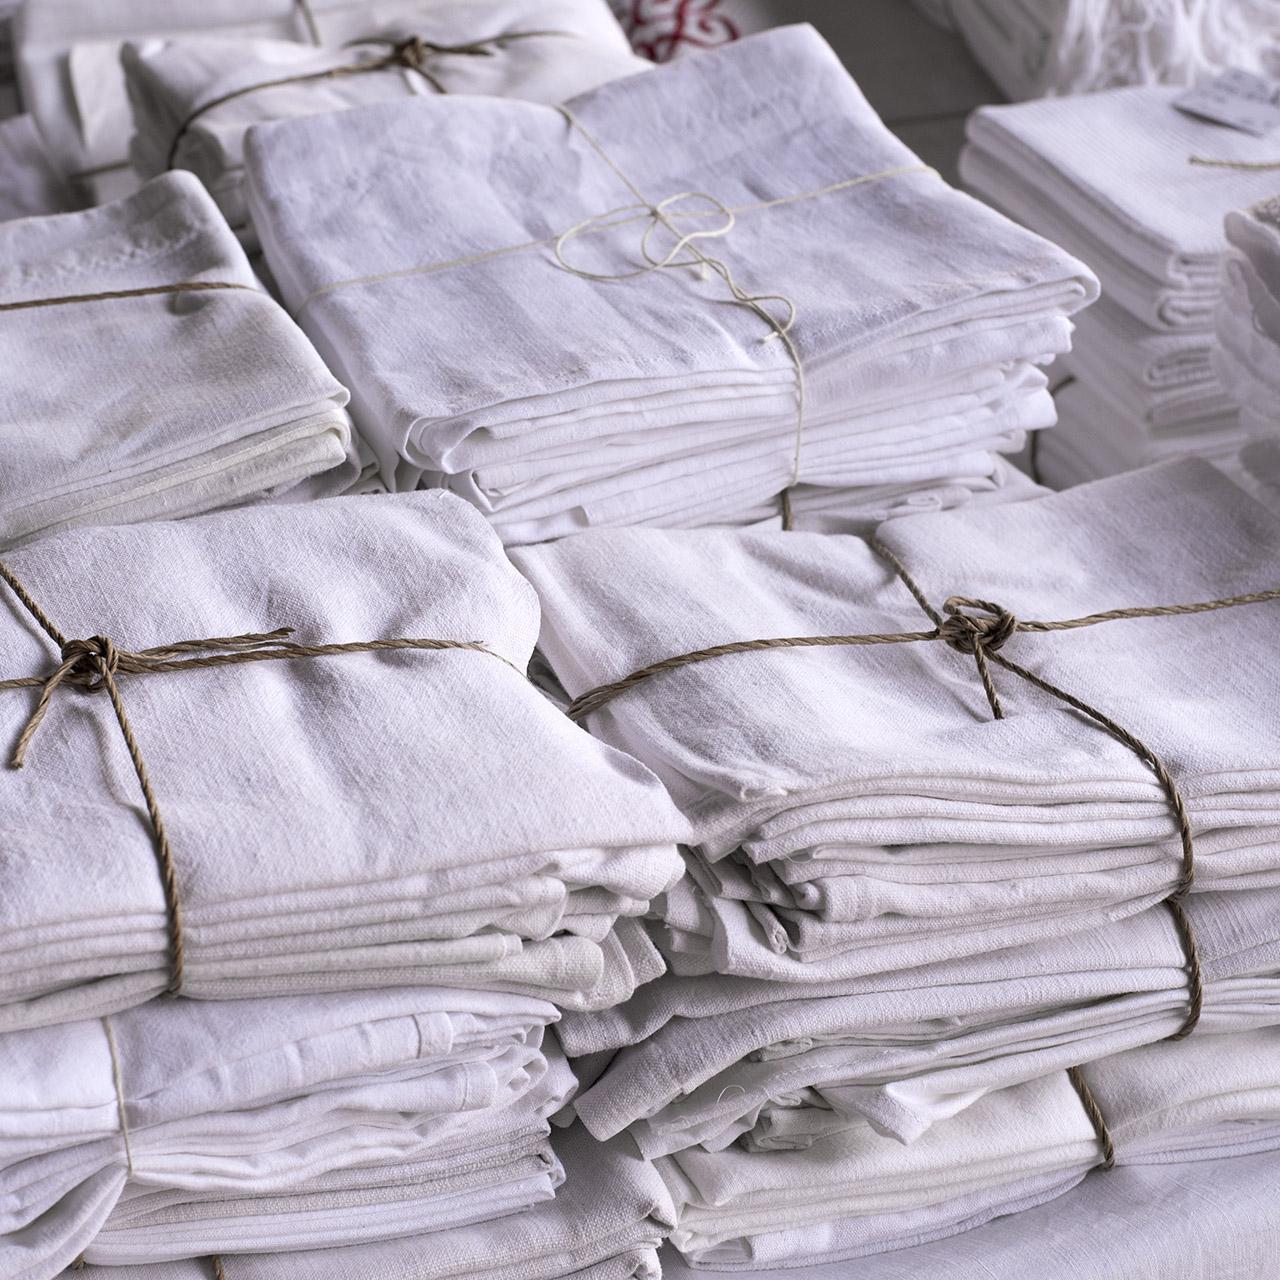 D365FO Sales order kitting bundles